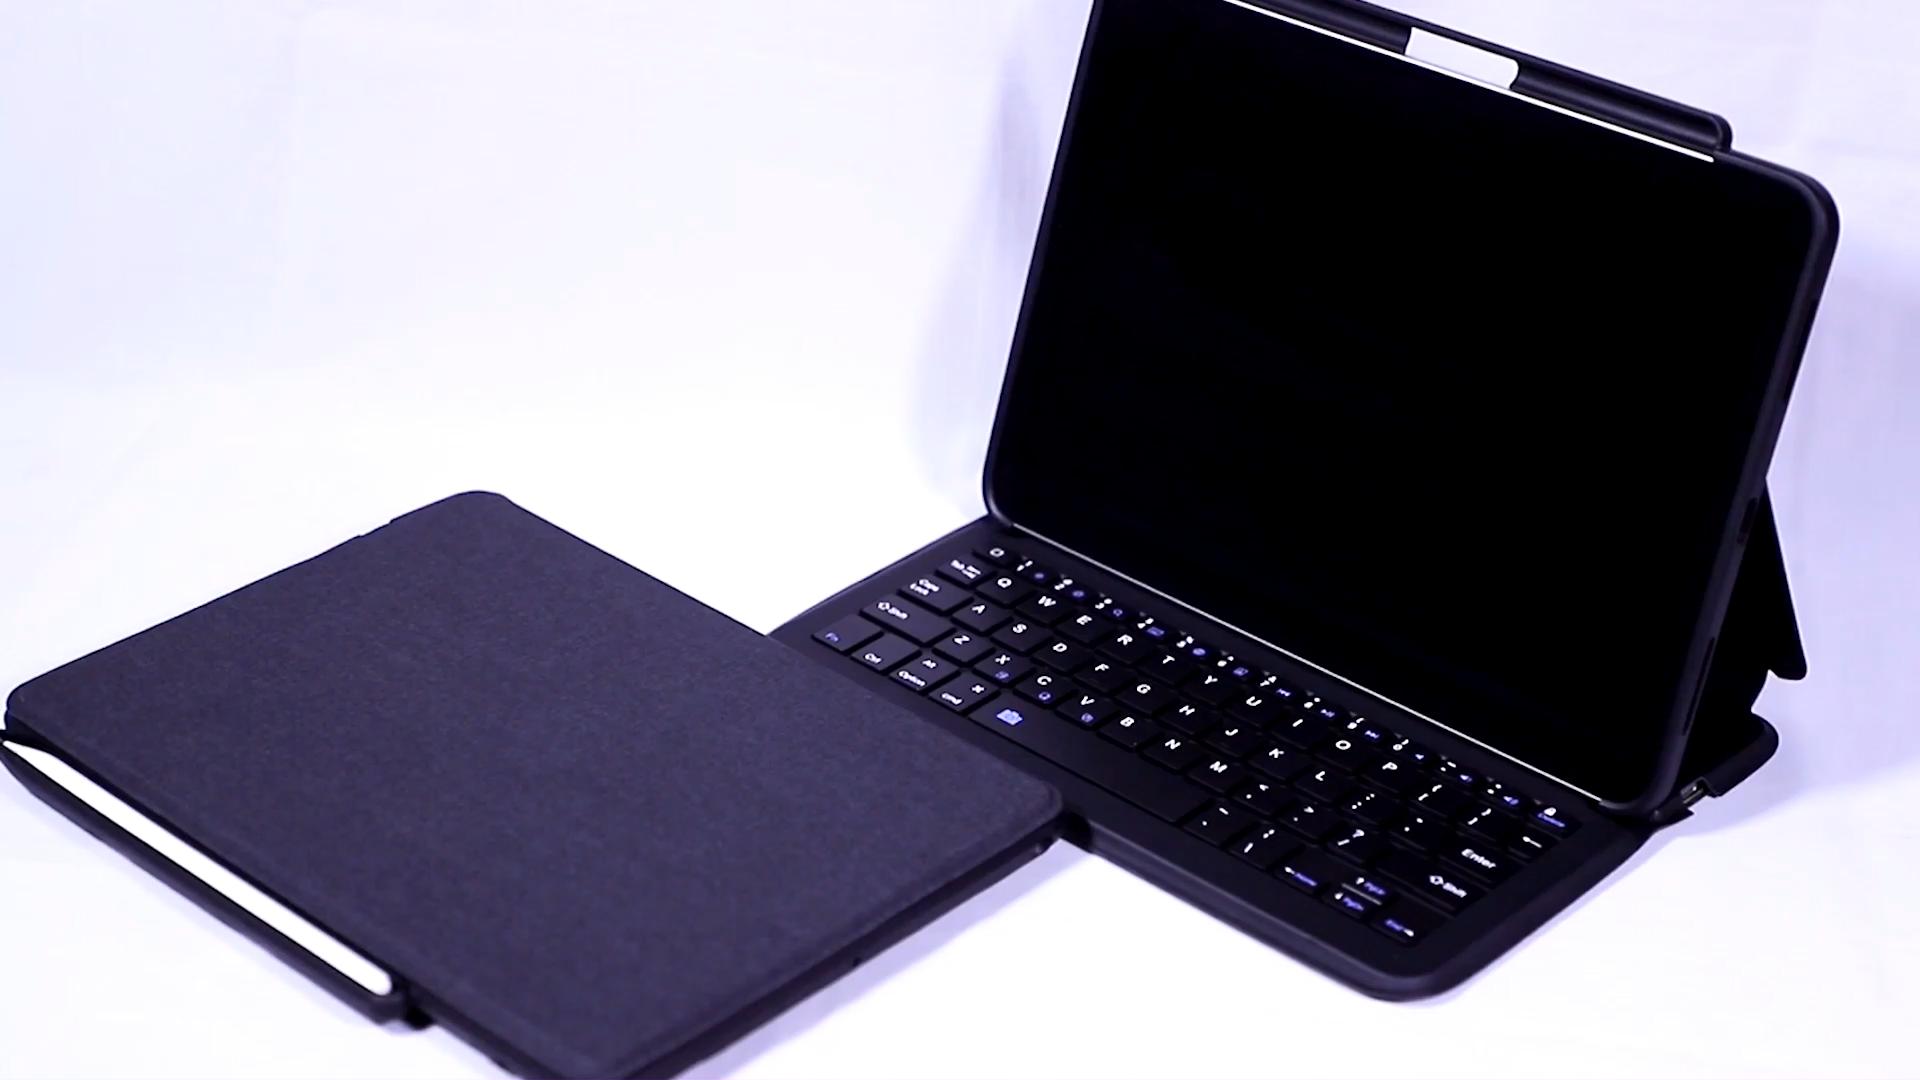 Bluetooth Tastatur Pro 12,9 2020 Fall Bleistift Halter Leder Schutzhülle Tablet Zubehör Abdeckung für iPad Tastatur fall